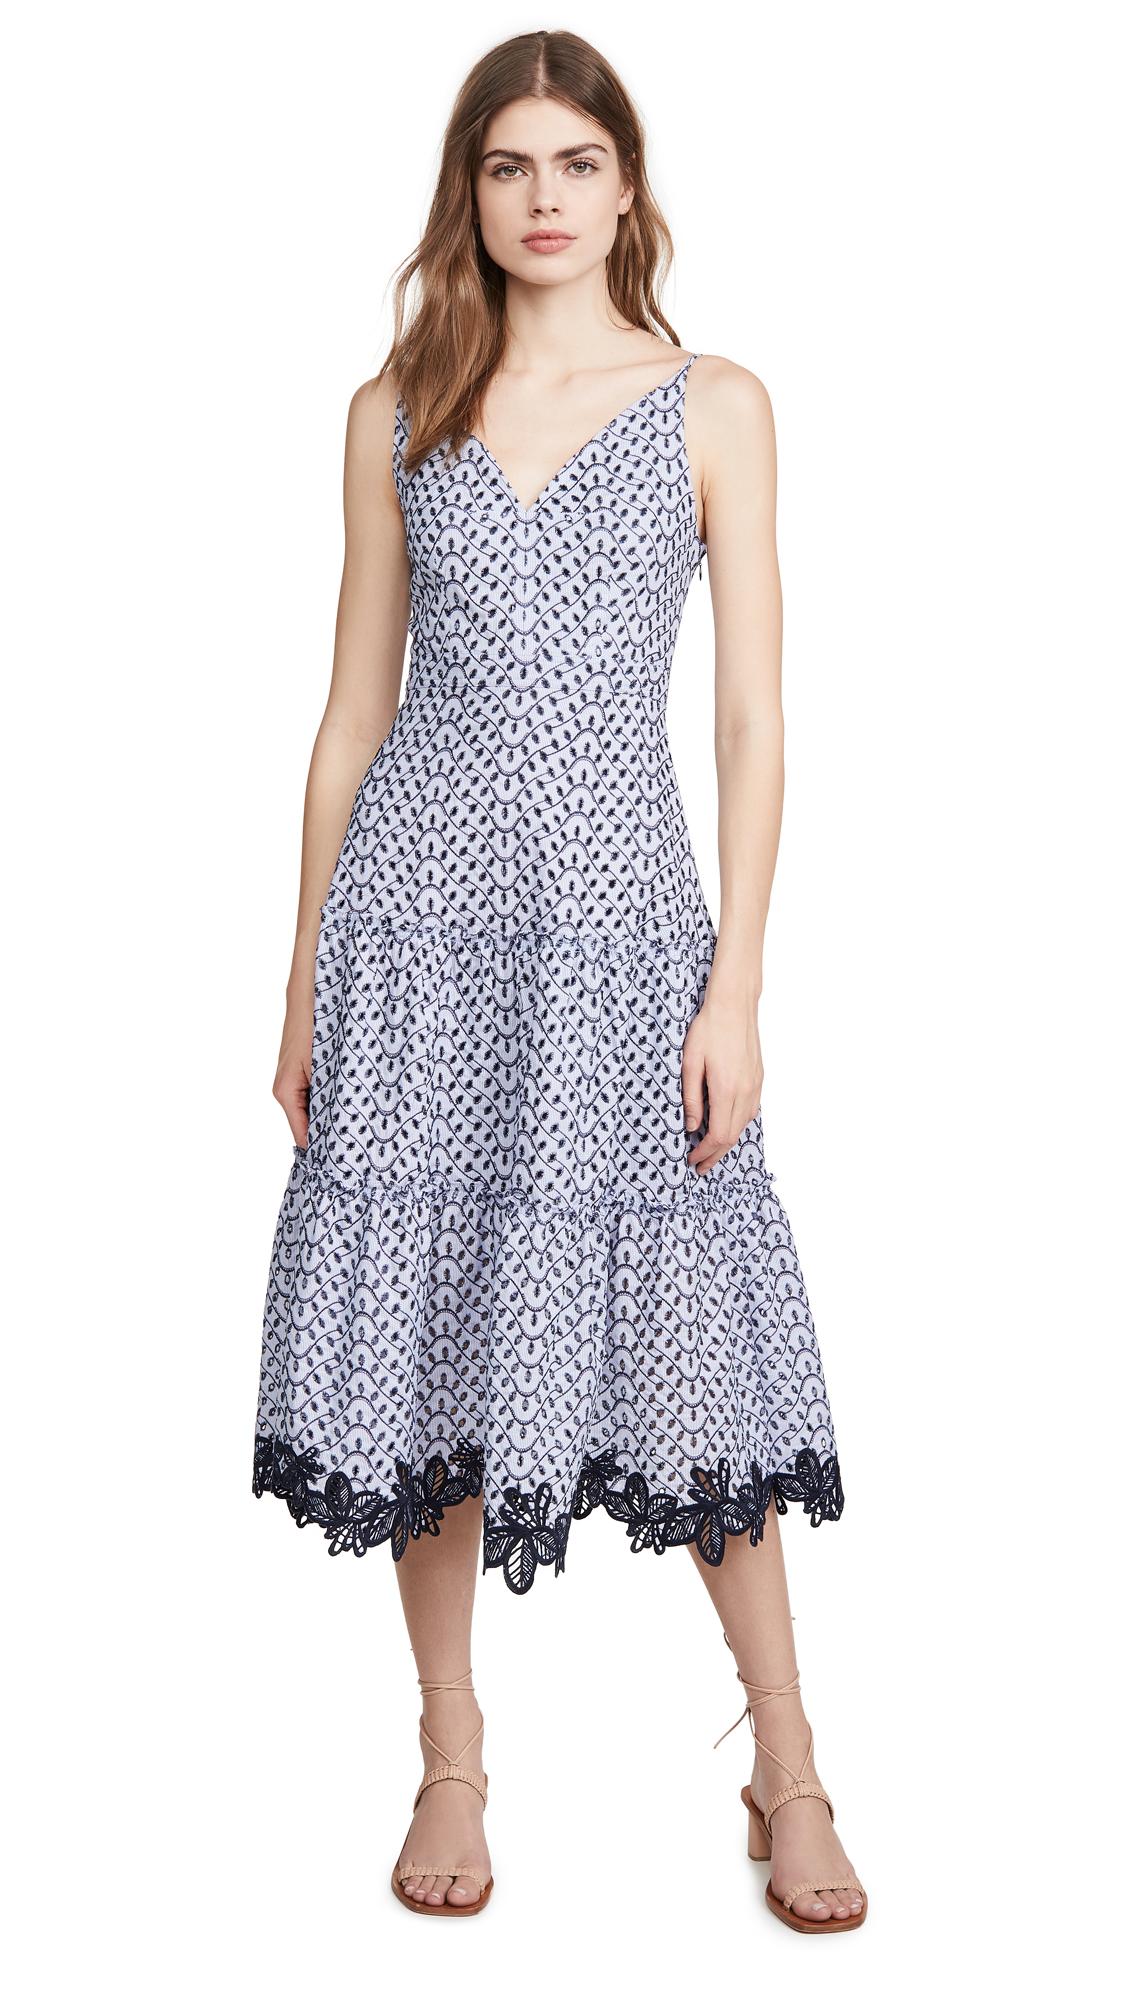 Derek Lam 10 Crosby Samaria Cami Dress - 30% Off Sale